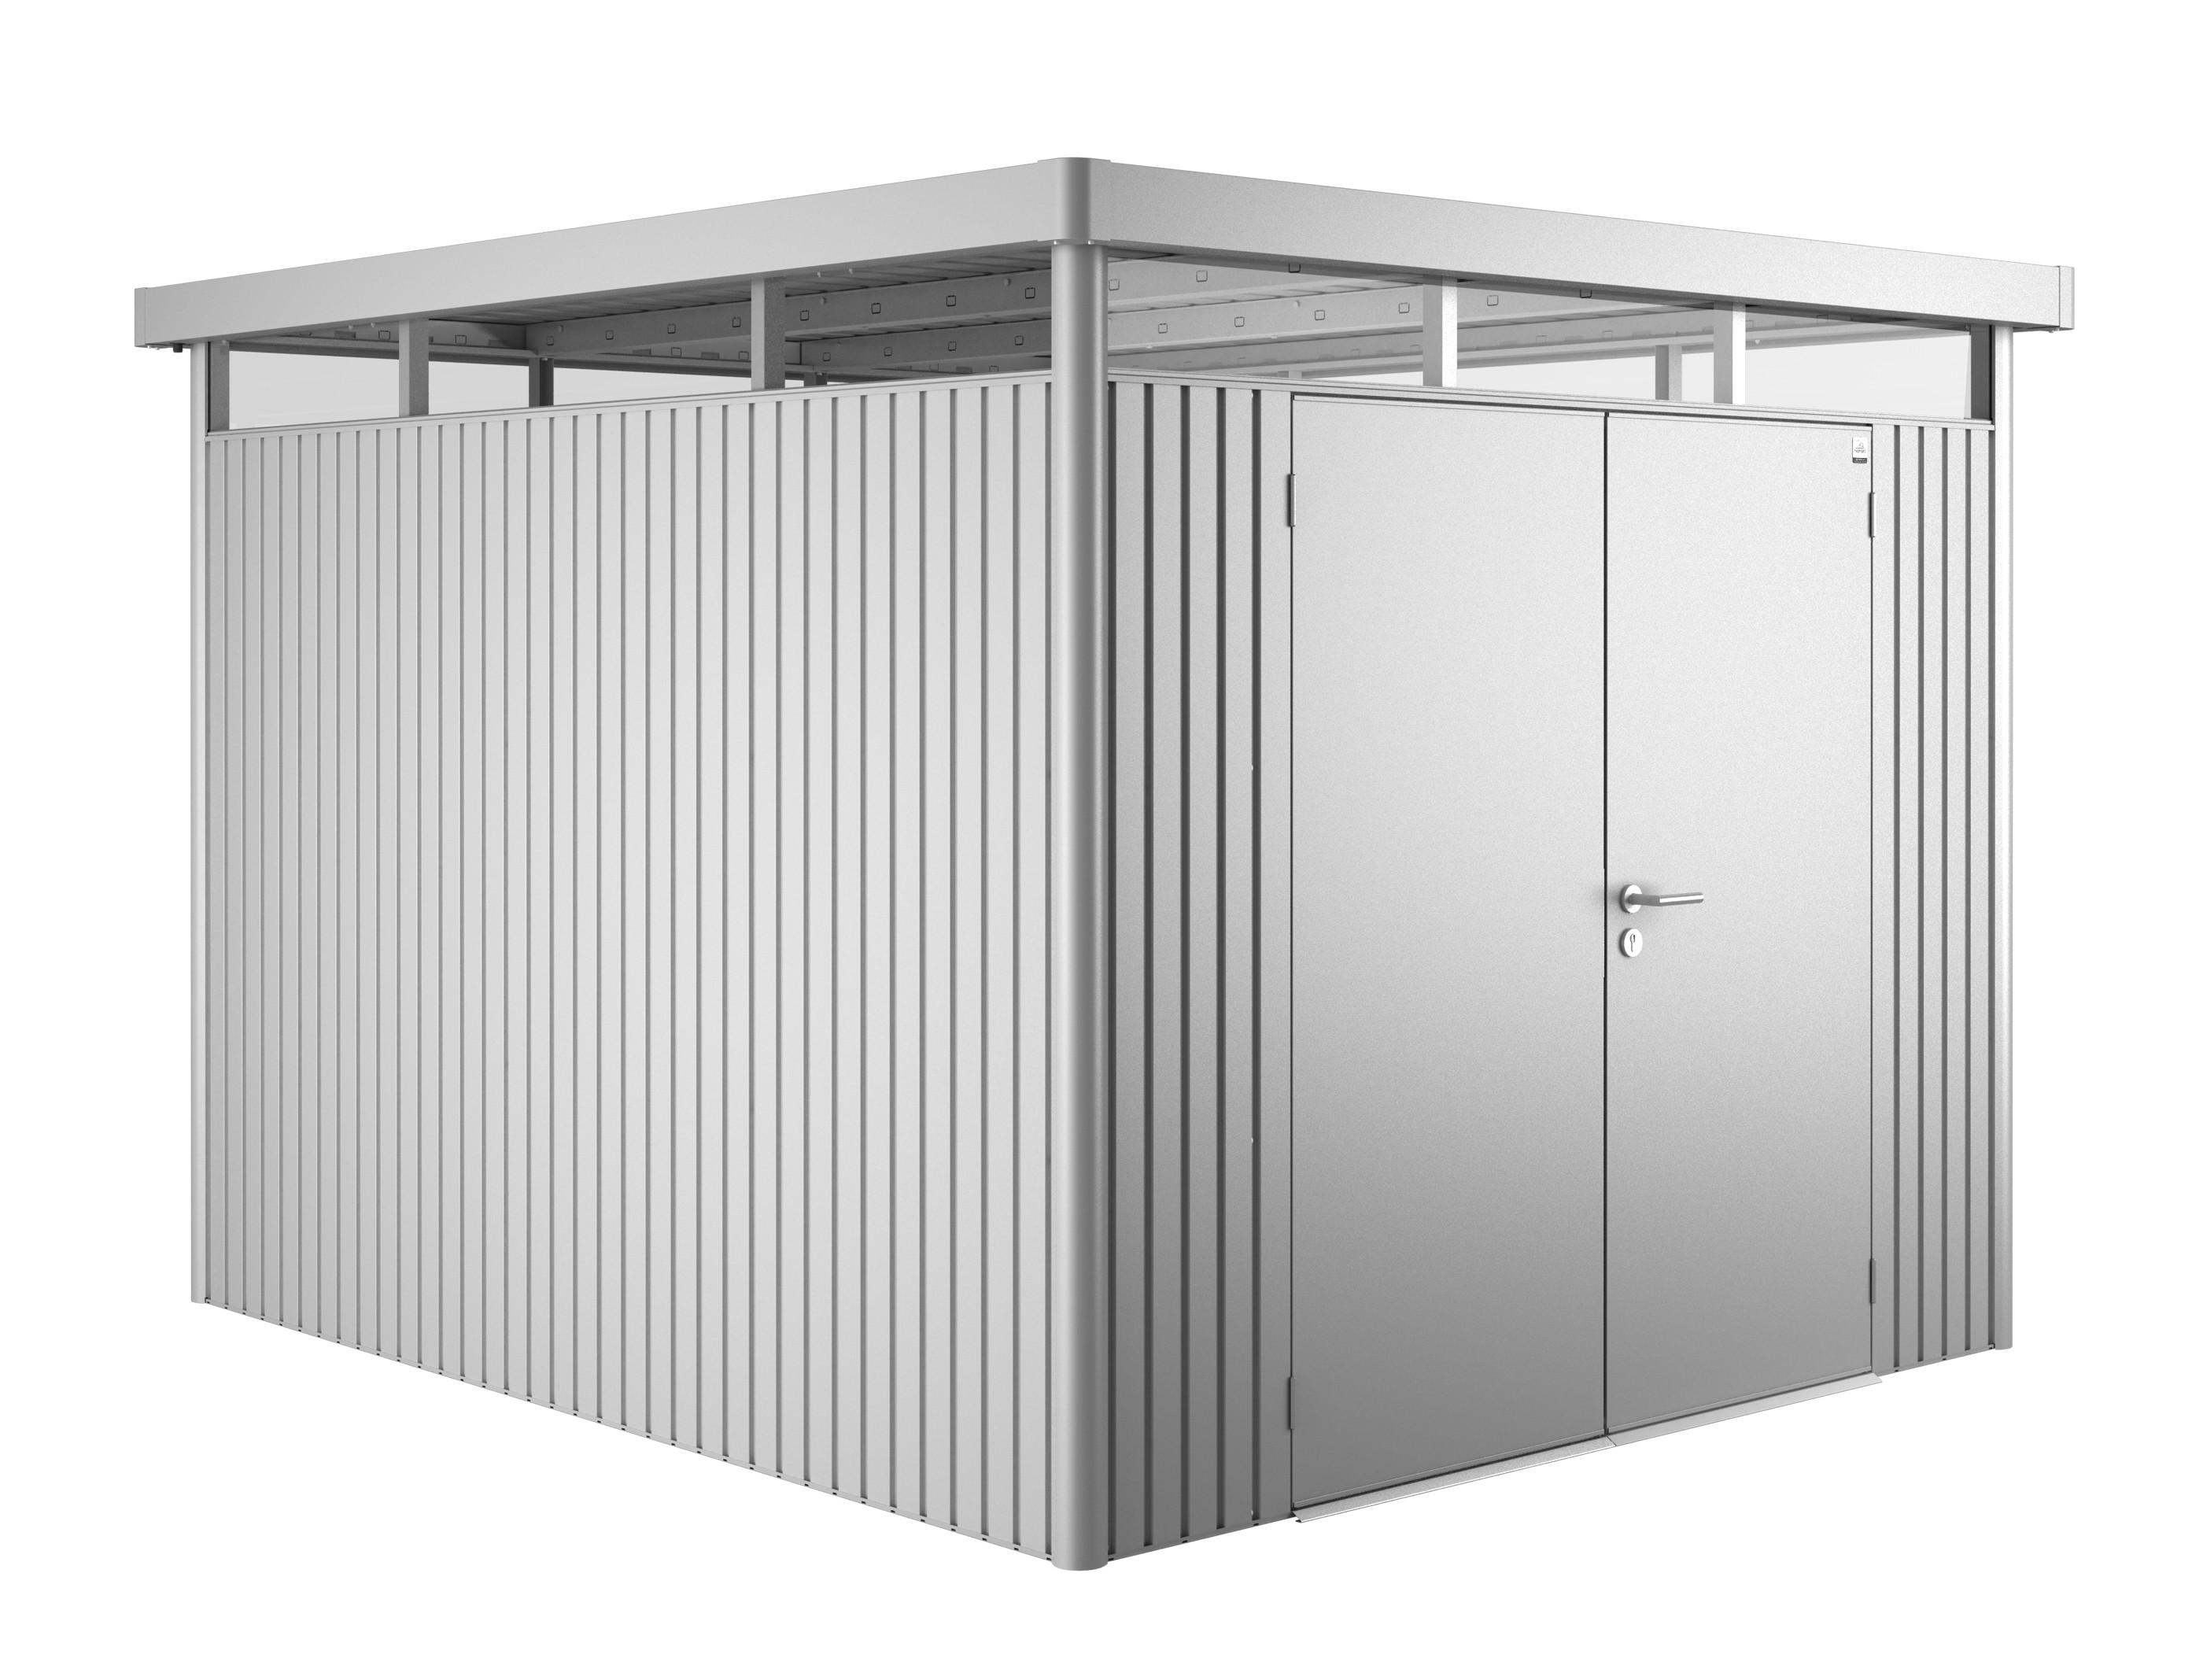 Gerätehaus Biohort HighLine H5 silber-metallic DT 275x315cm Bild 1